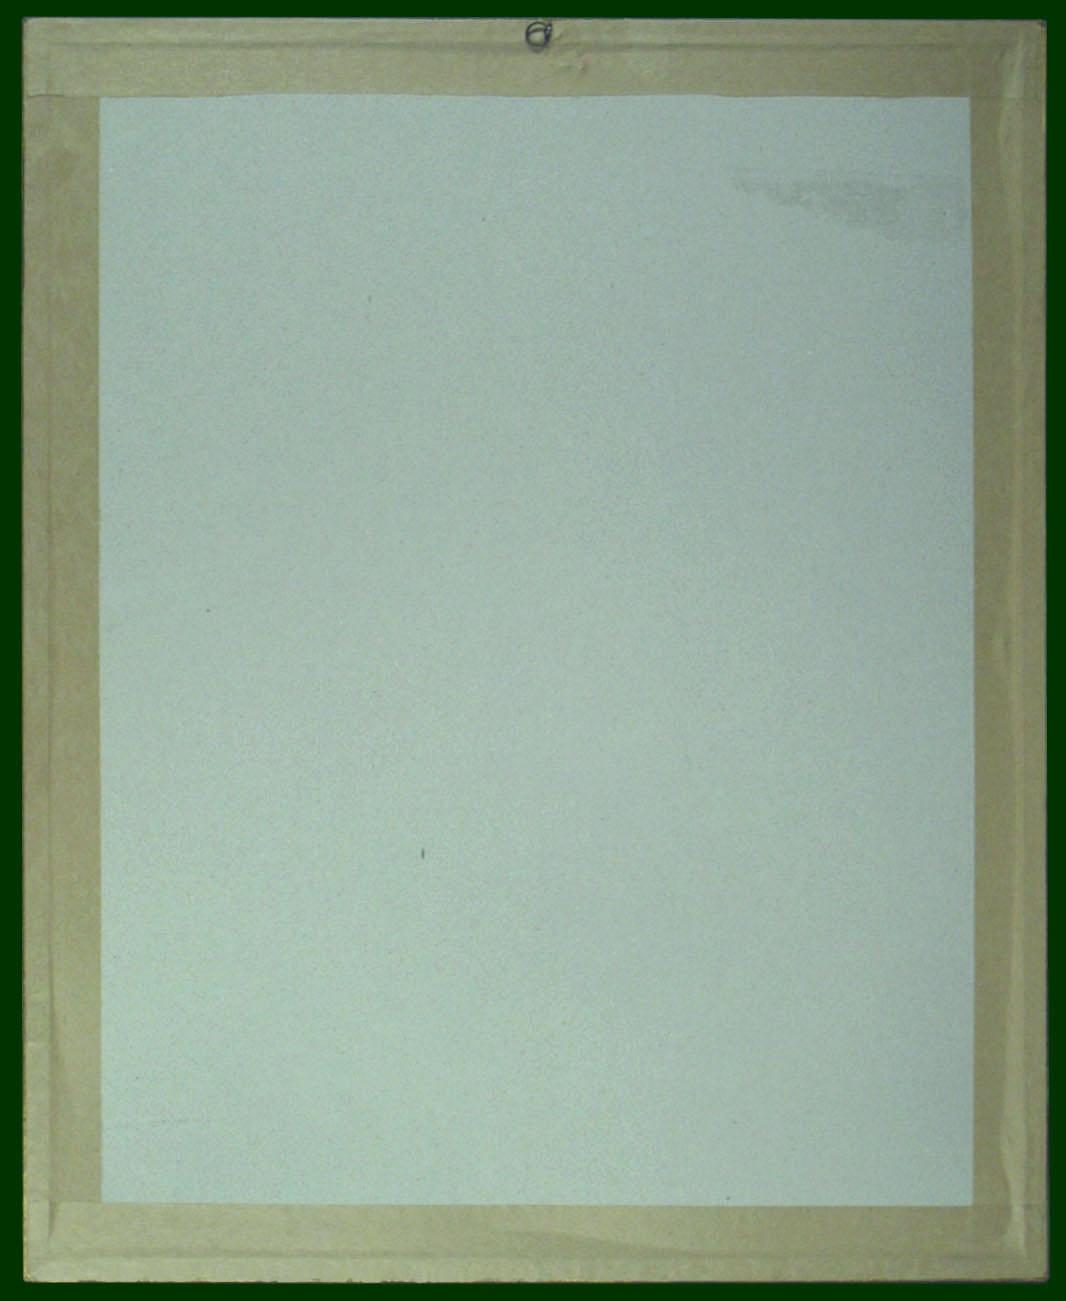 66-19hat buher.jpg (1066×1301)